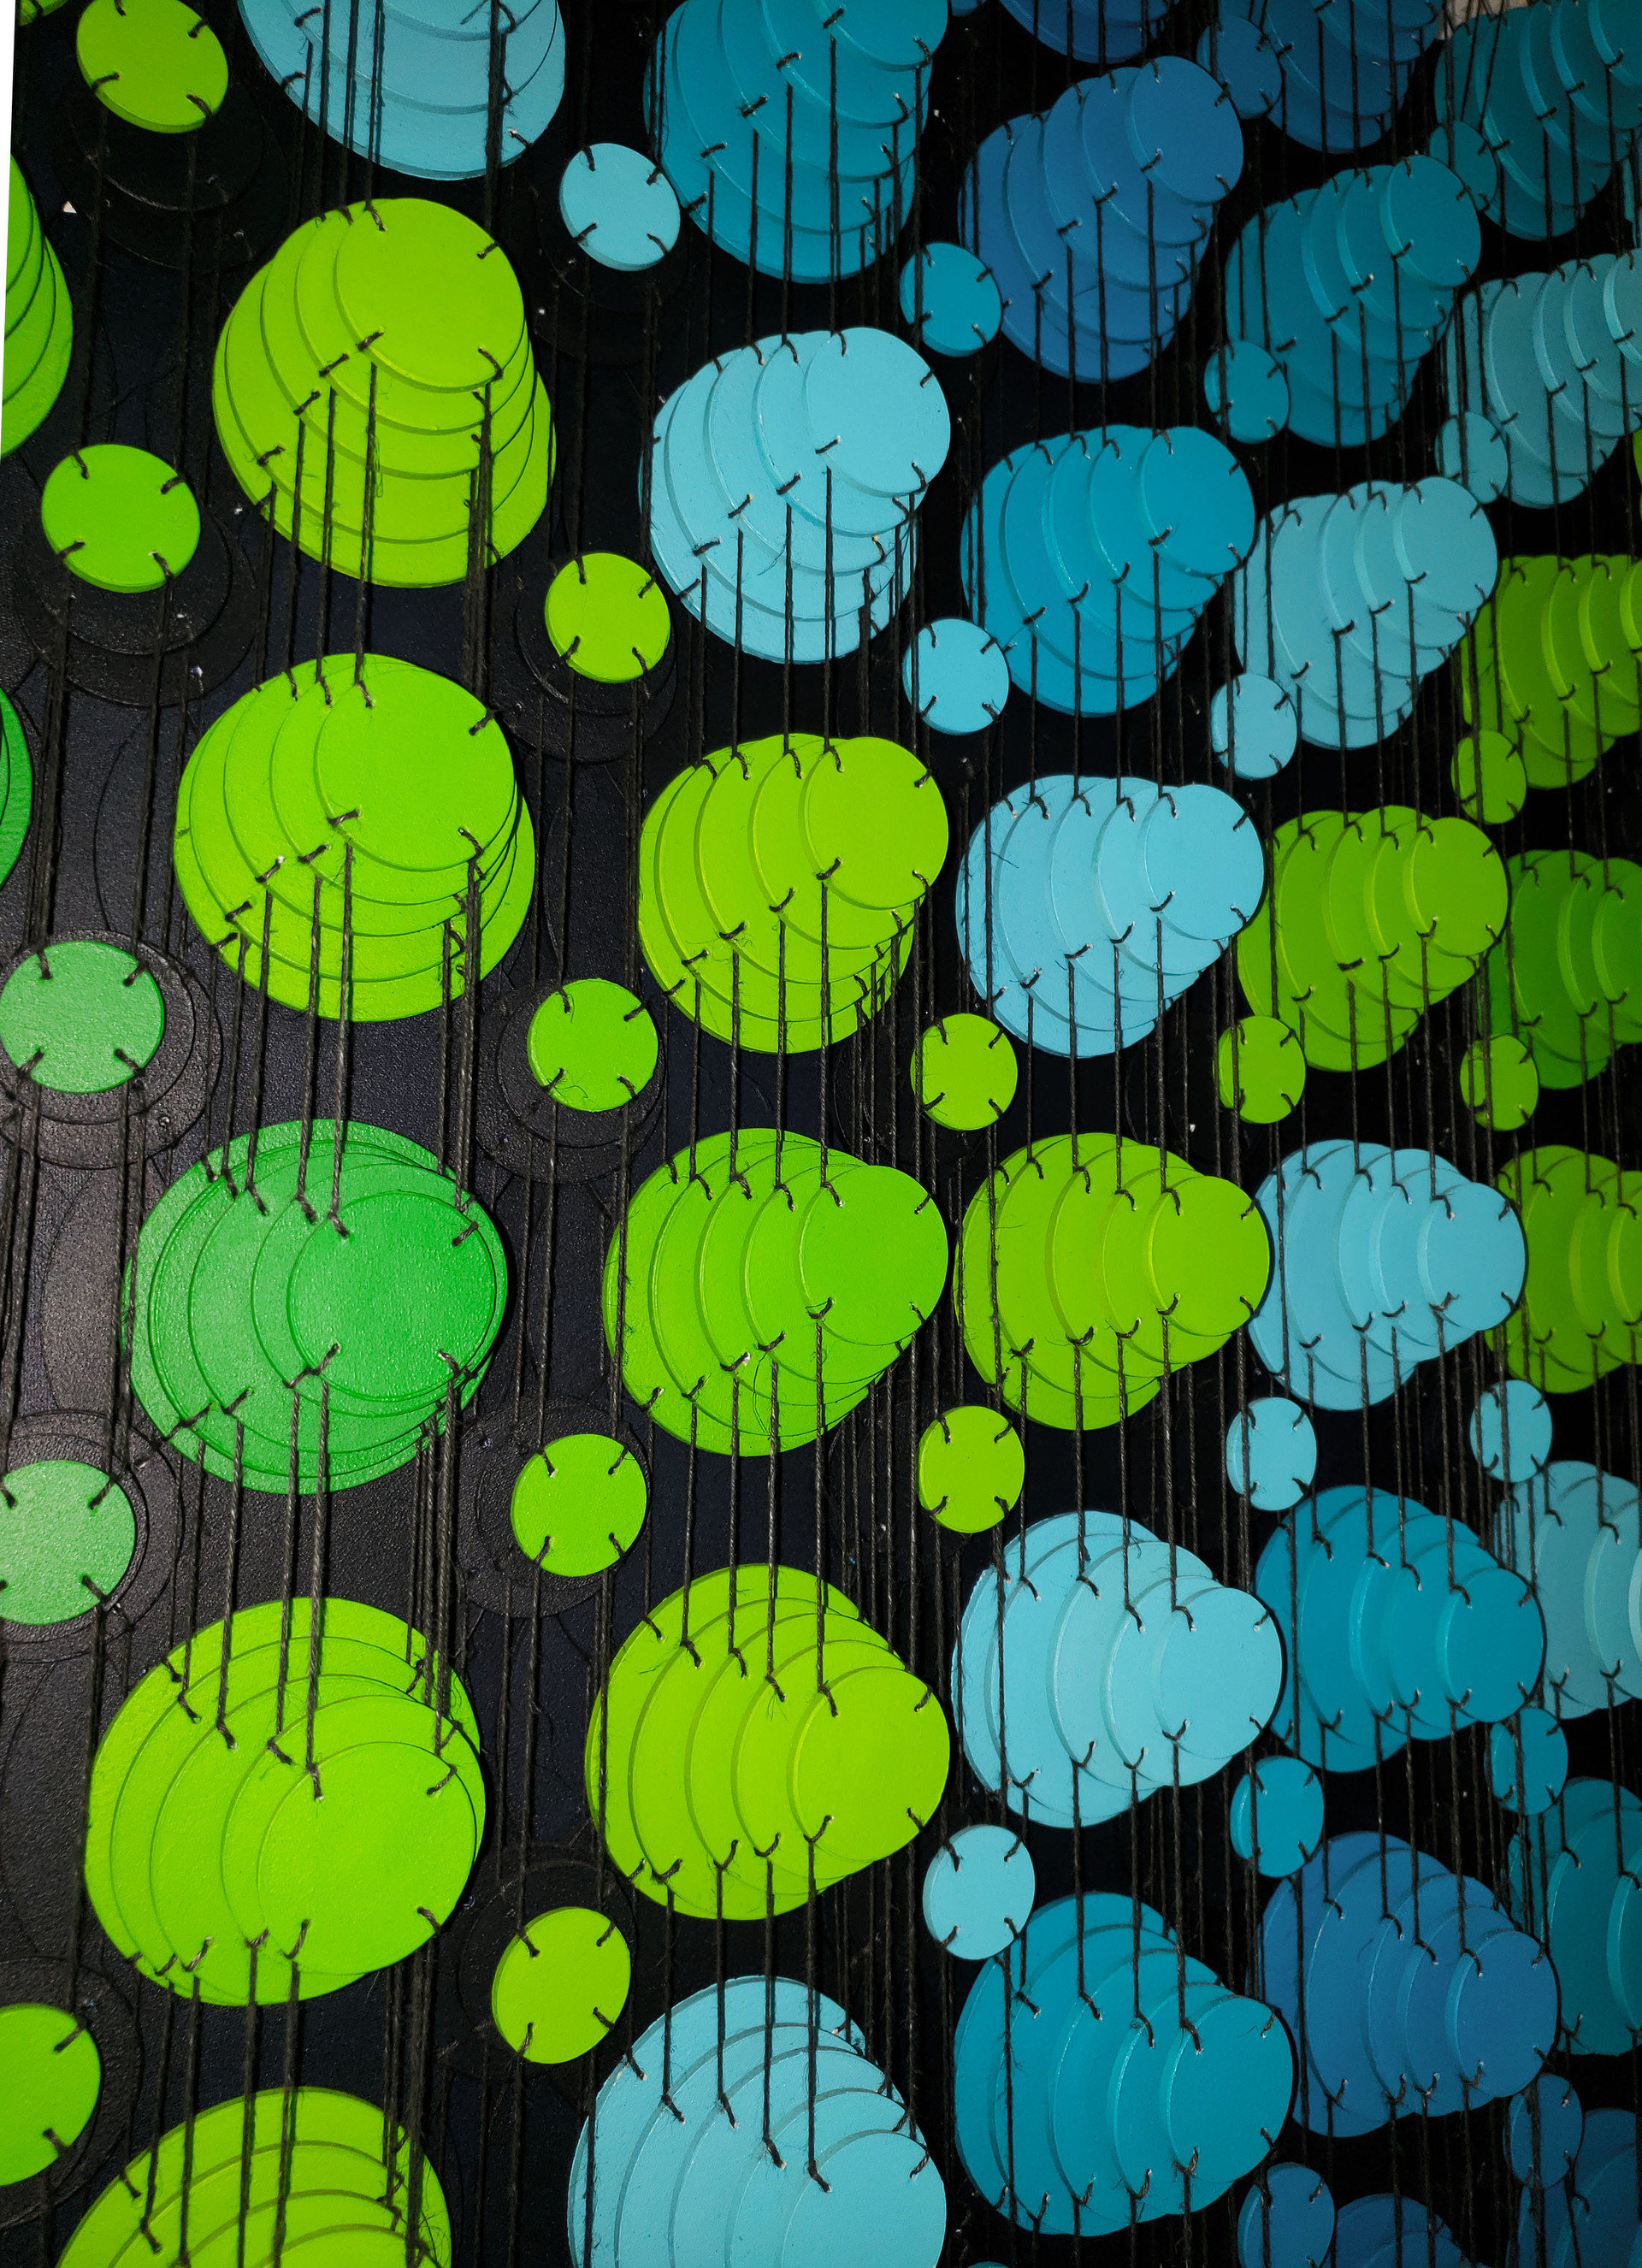 Cecilia Glazman Turqoise popps 2017 Papel y madera pintado a mano e hilos (Hand painted paper and wood, thread) 100 x 100 cm.